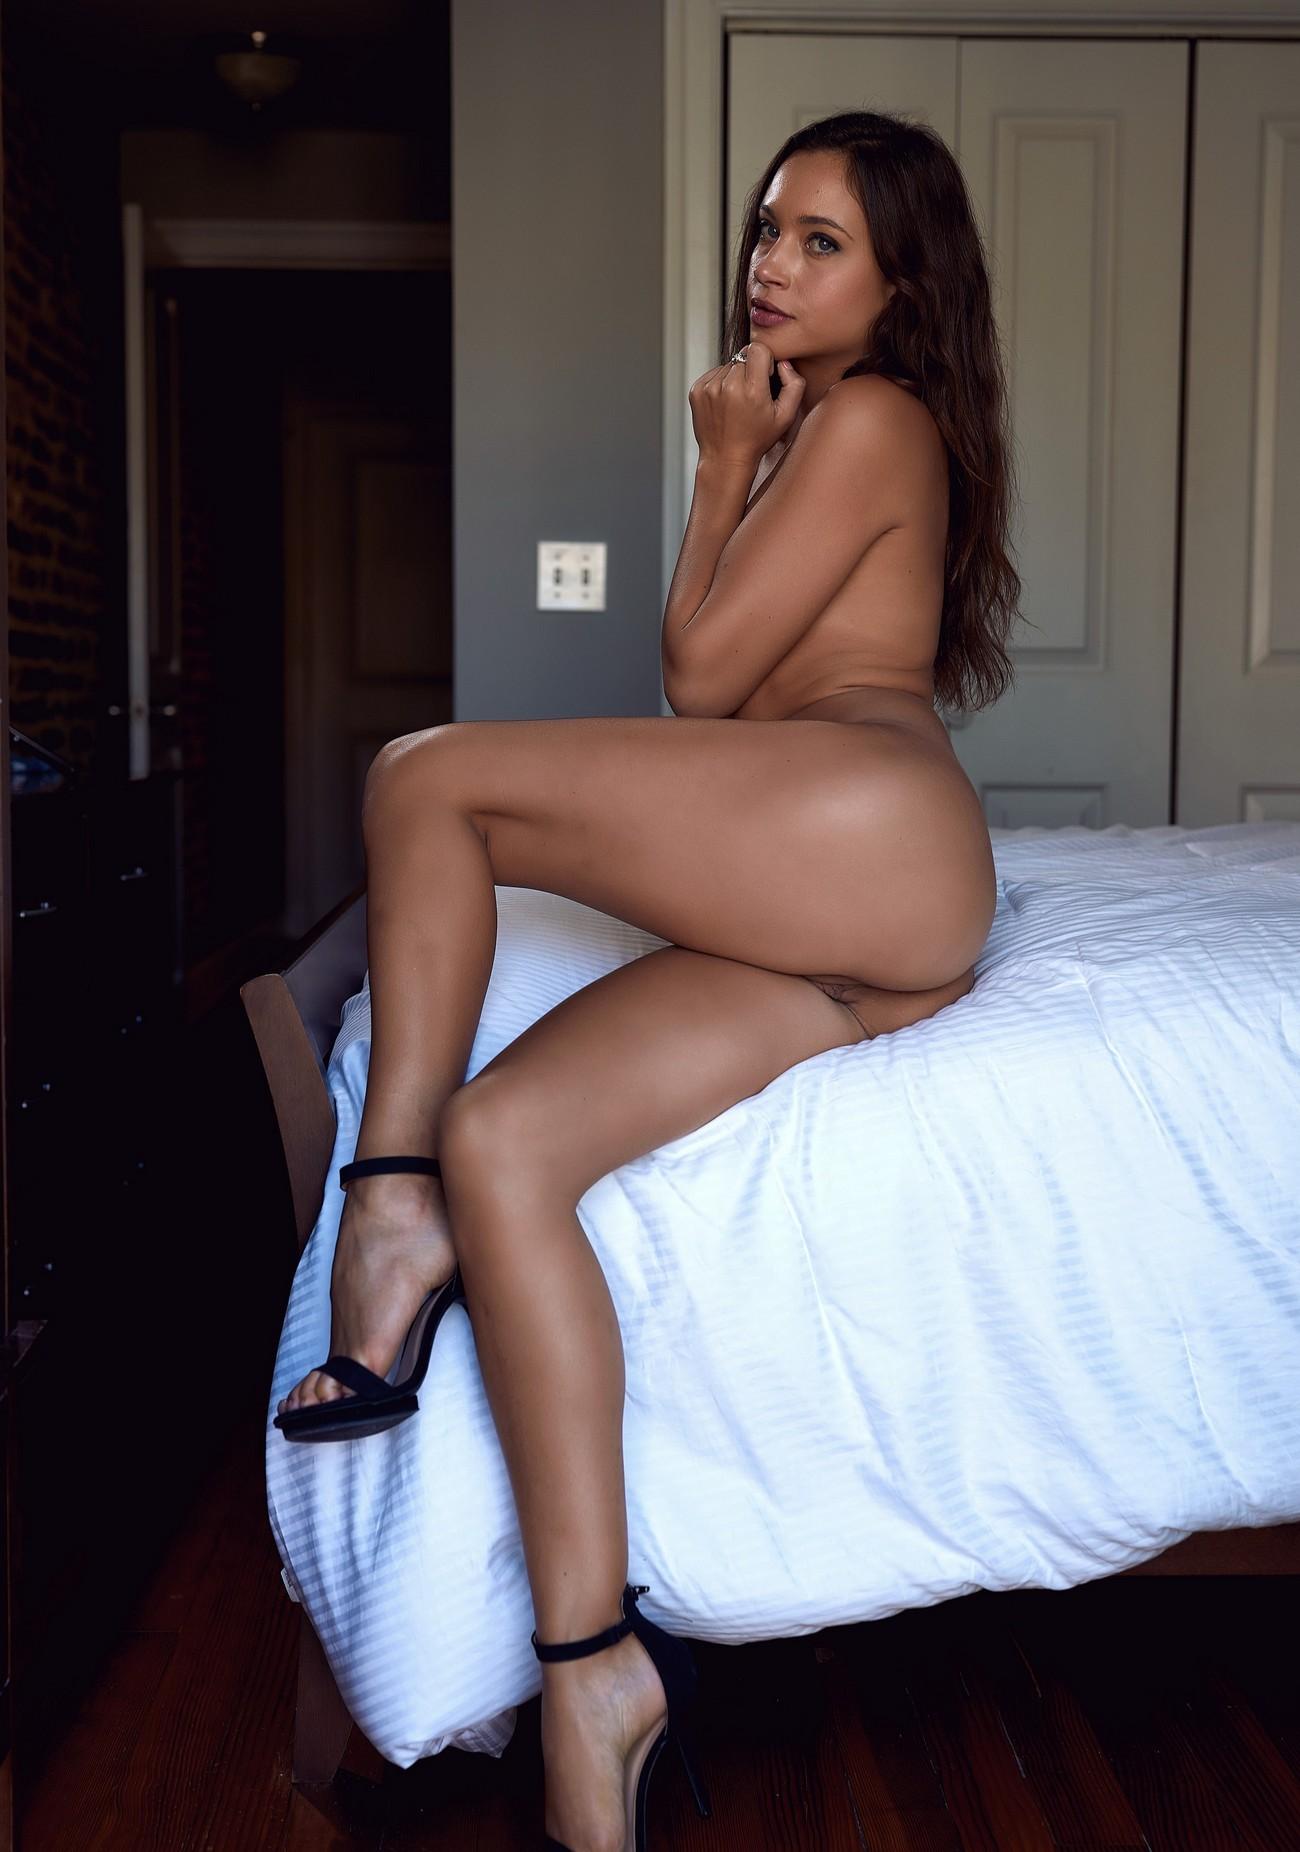 Sofia Jolie Nude 0065